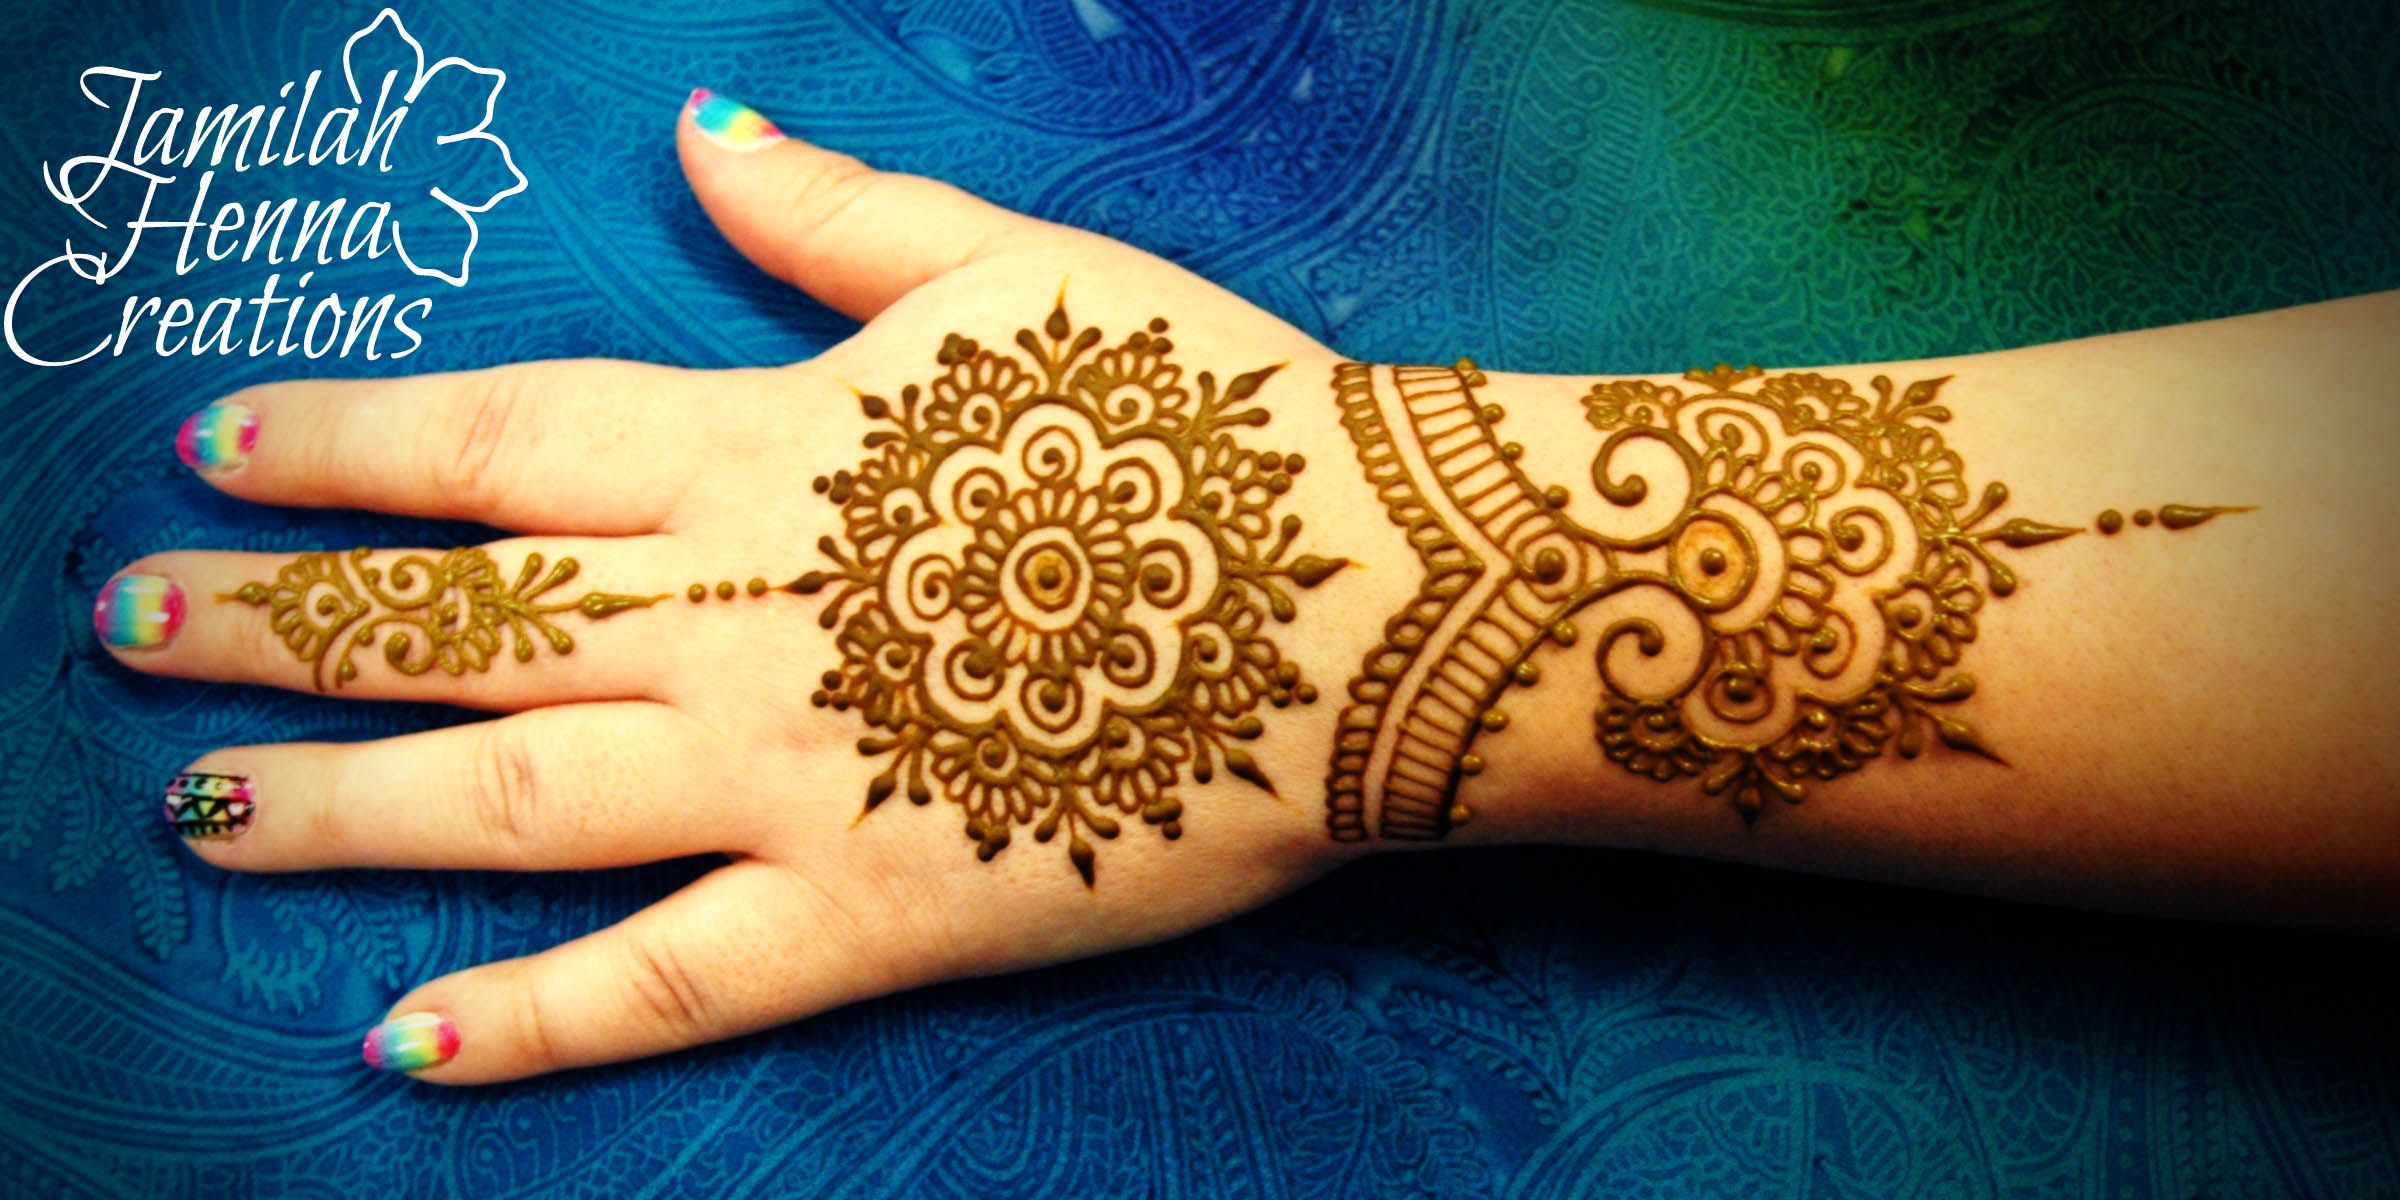 Henna Cuff Www Jamilahhennacreations Com: Mandala Cuff And Ring Henna Www.JamilahHennaCreations.com